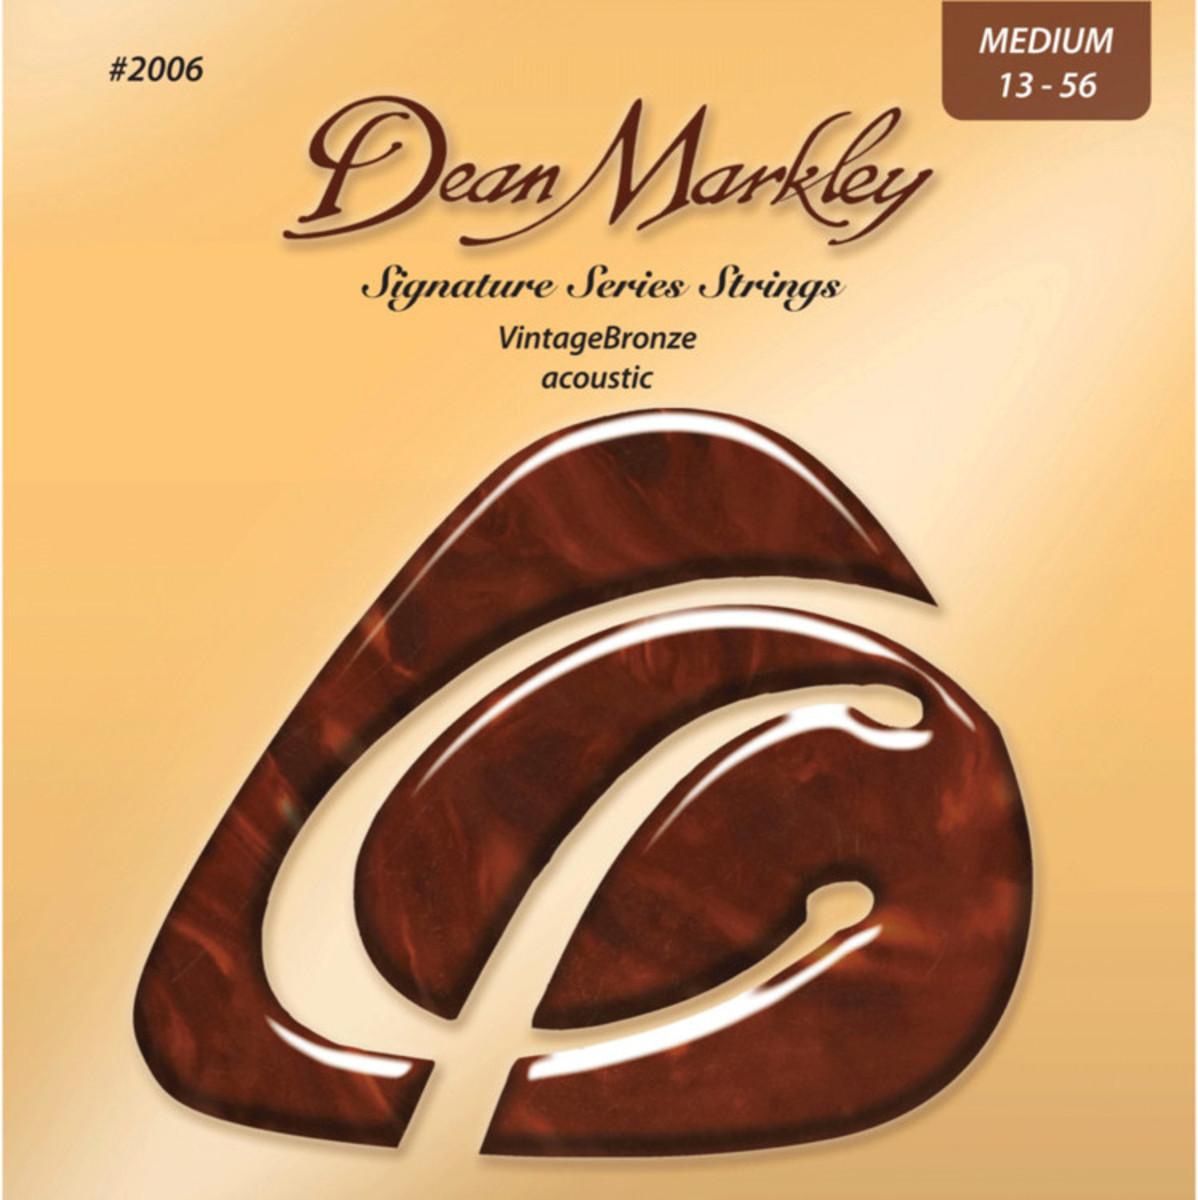 Image of Dean Markley Med Vintage Bronze Signature Acoustic Strings 13-56